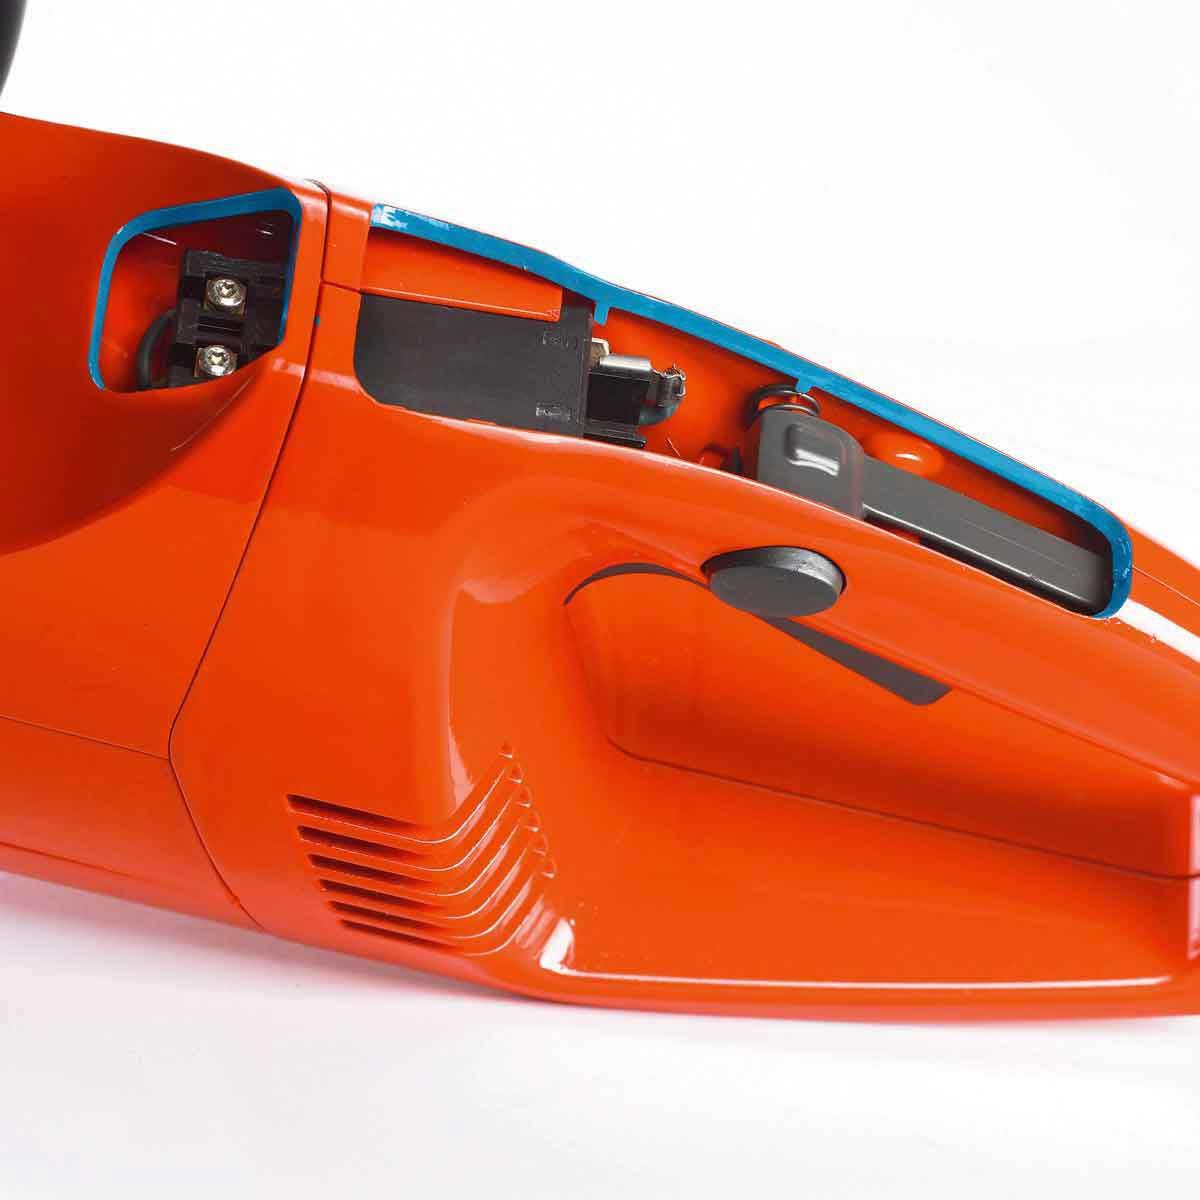 Husqvarna K3000 Vac electric switch